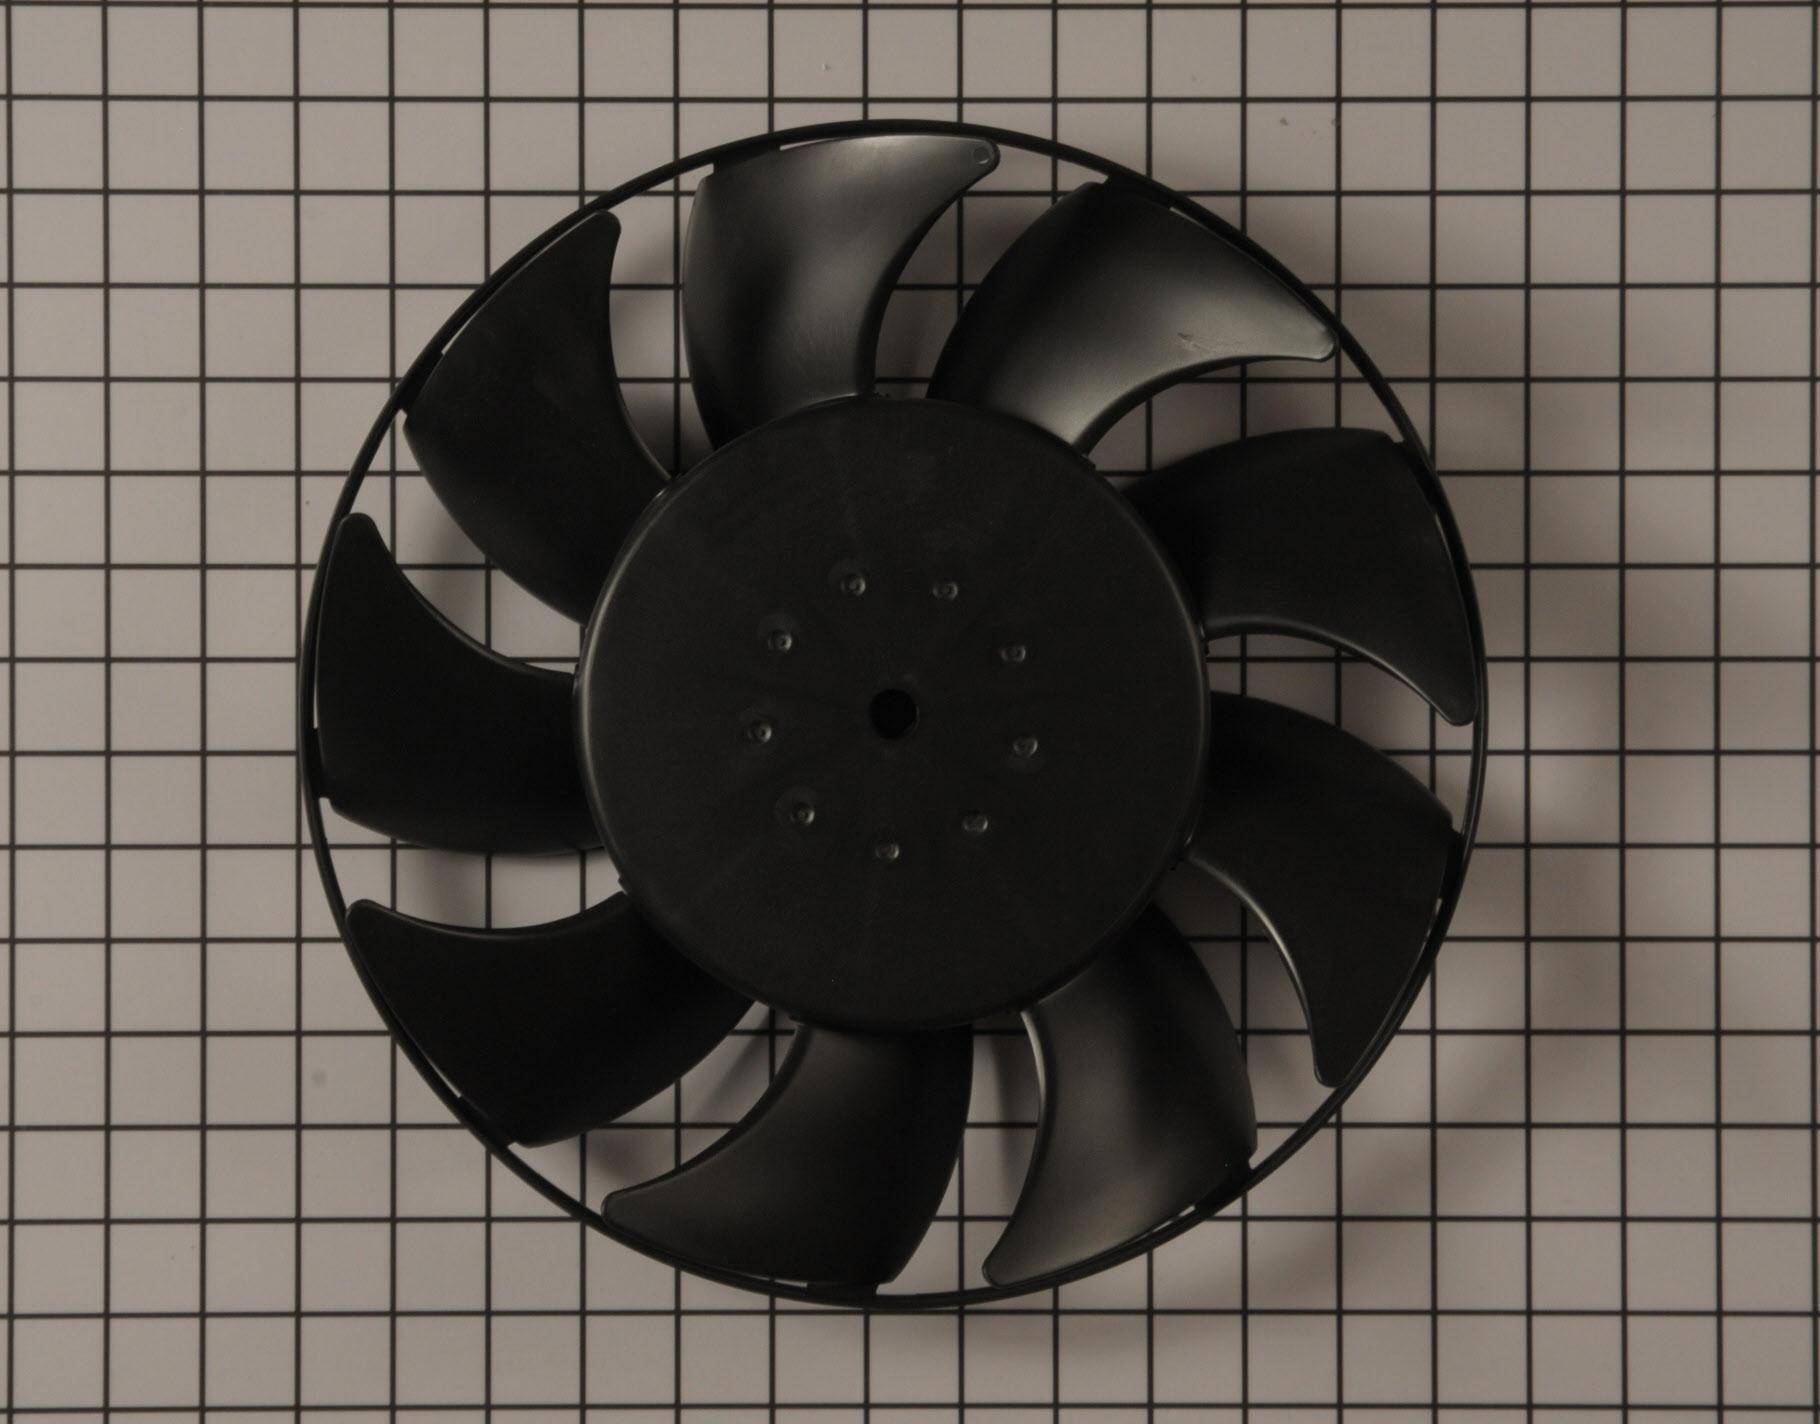 20414601 Goodman Central Air Conditioner Part -Fan Blade